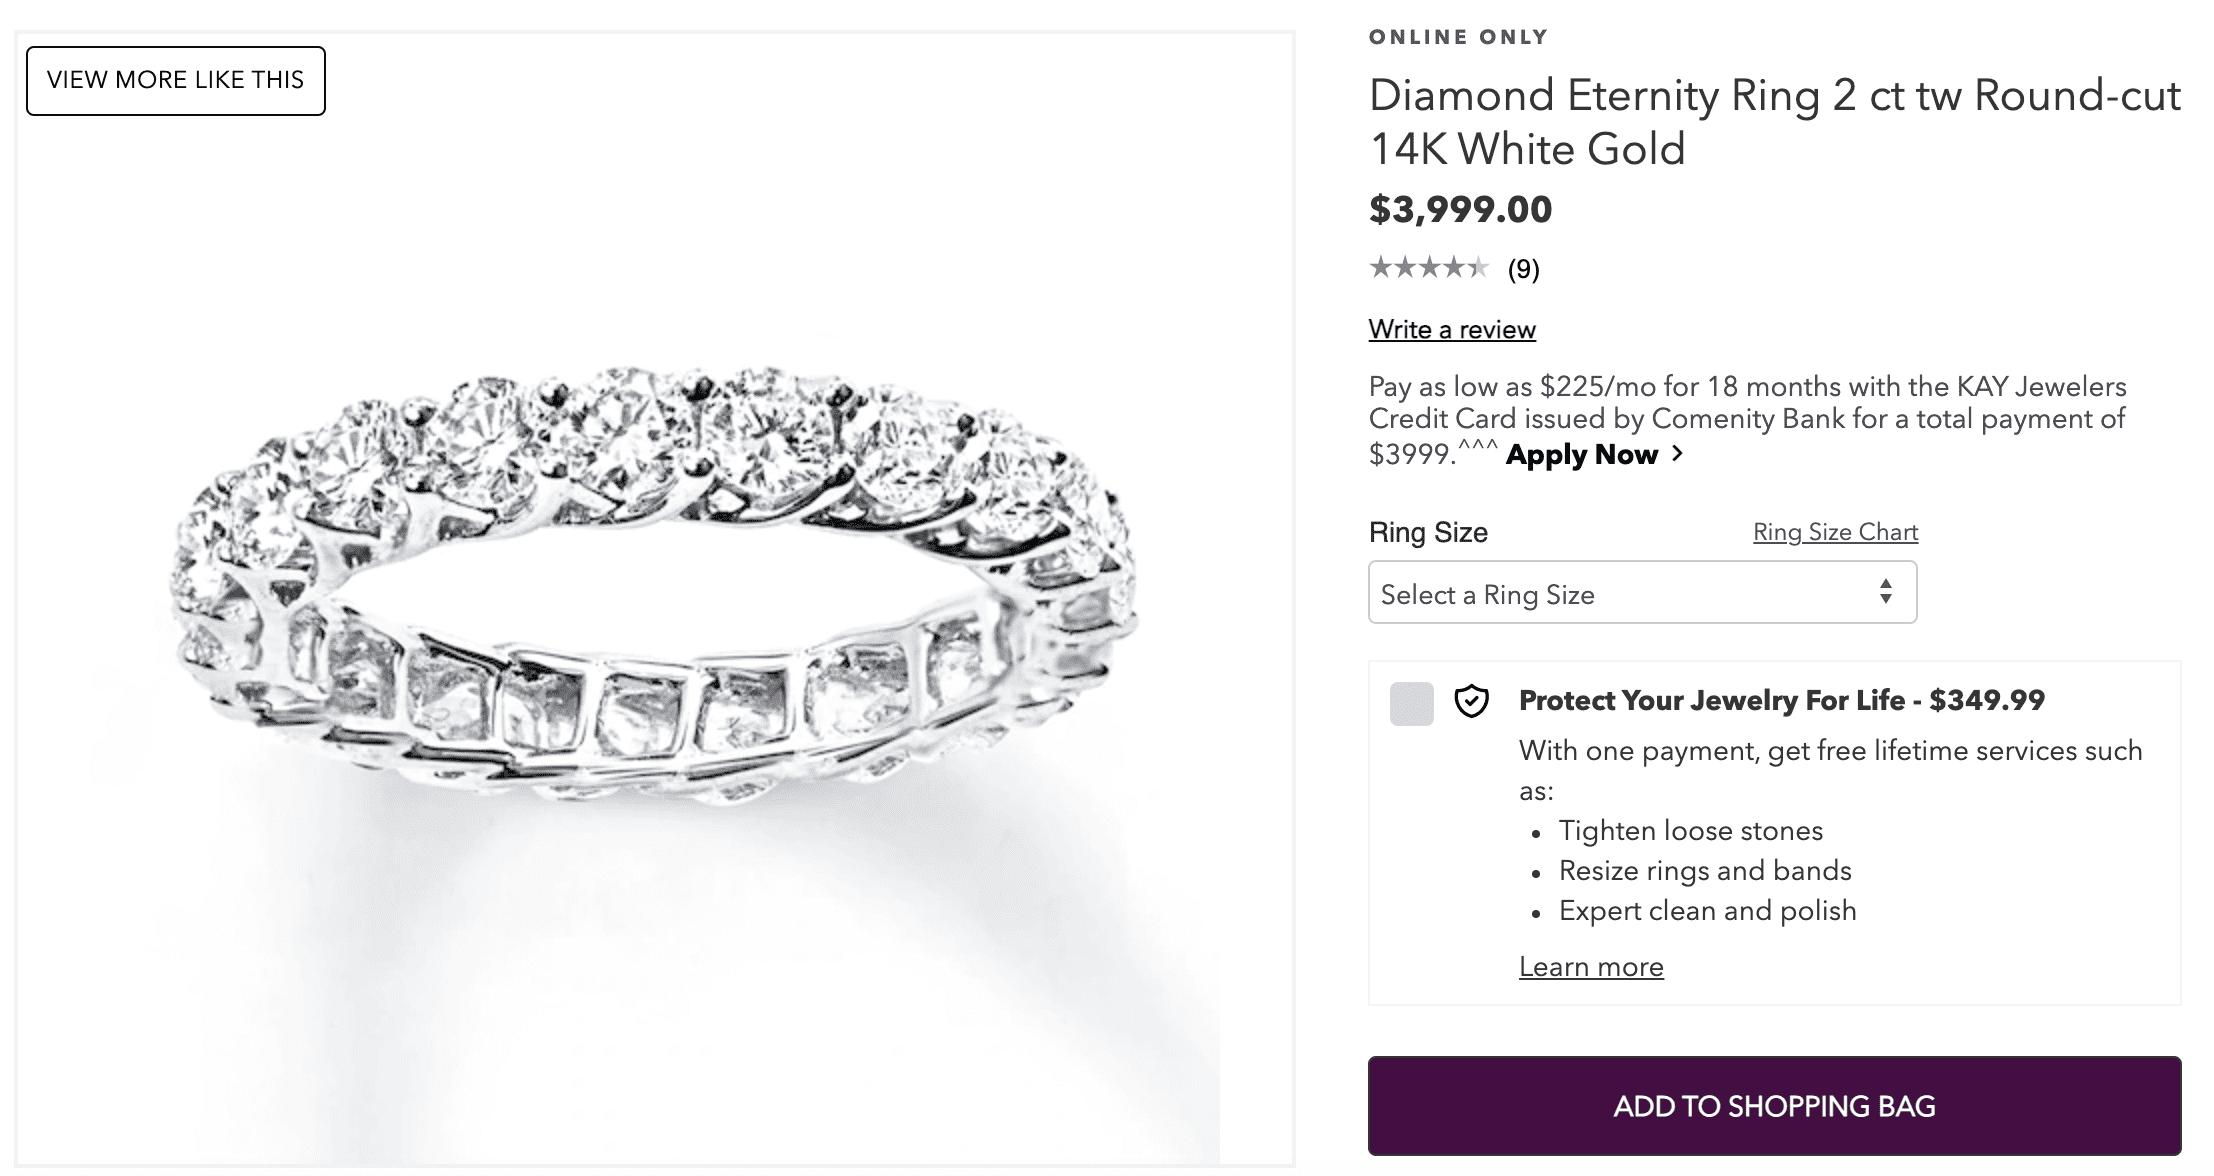 diamond eternity ring 2 ct Round-cut 14k White Gold